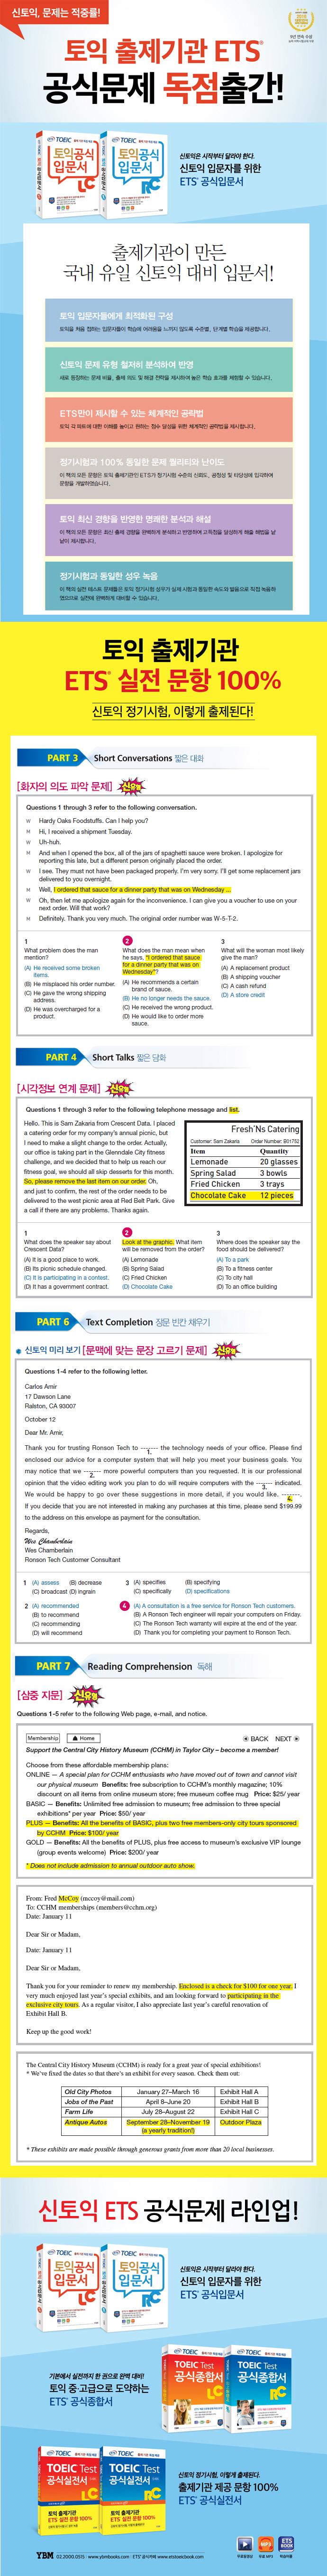 ETS 토익 공식입문서 LC 도서 상세이미지